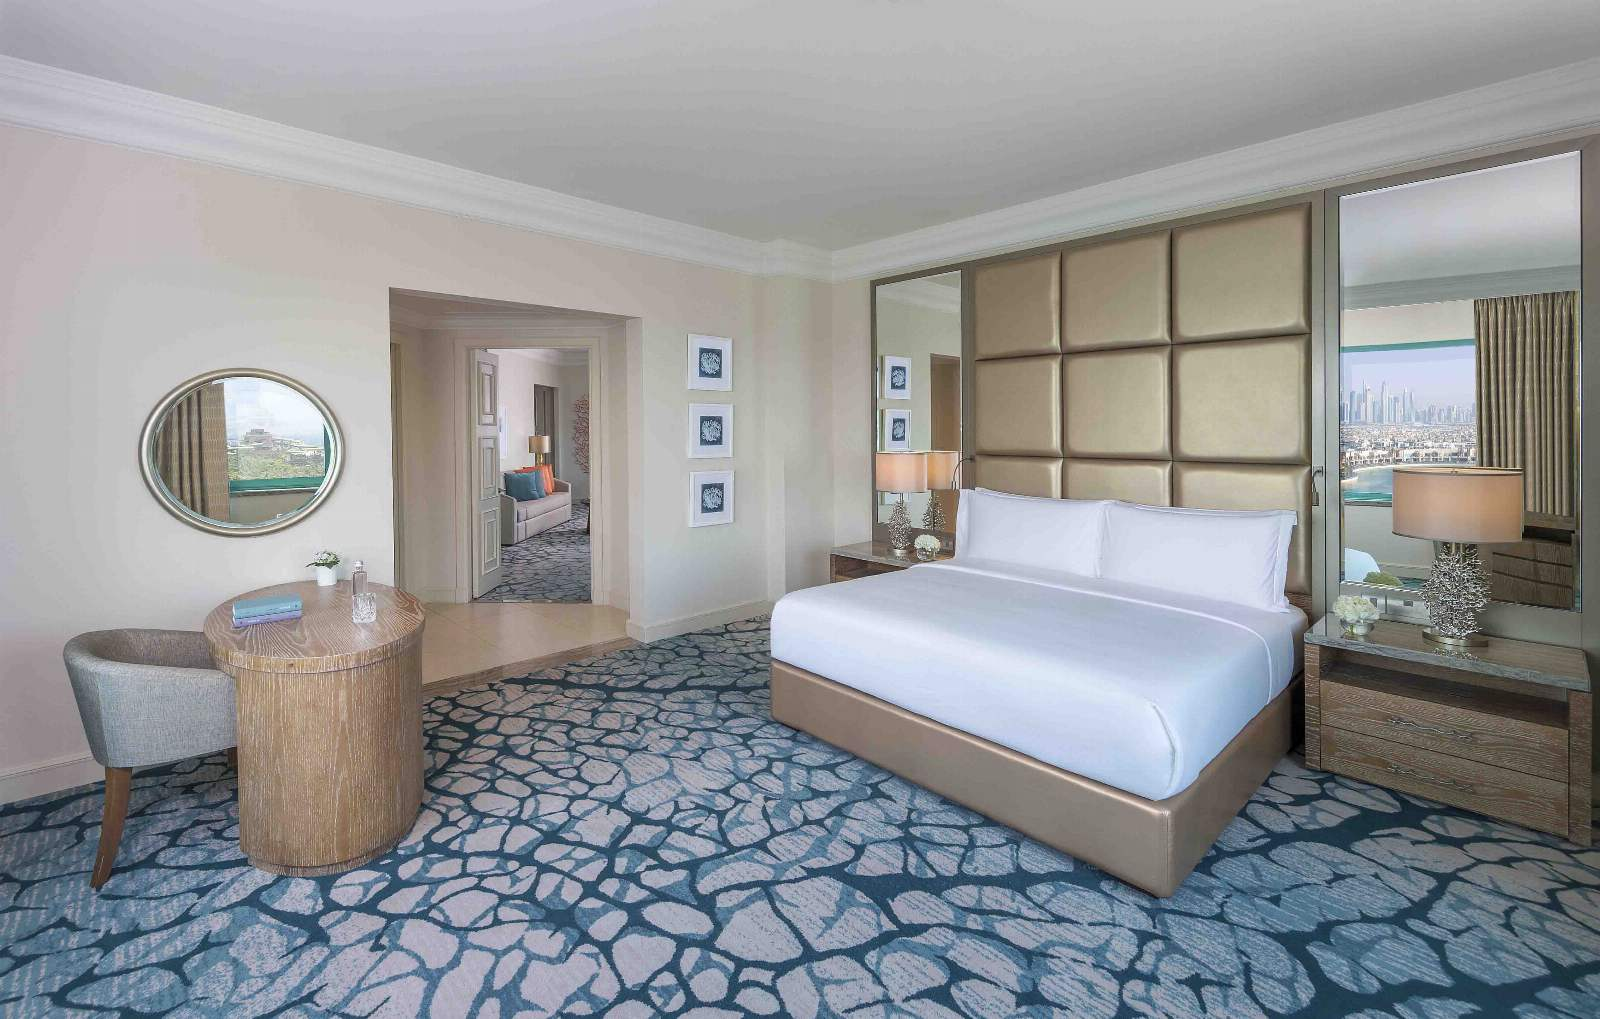 Atlantis, The Palm - Executive Club Suite